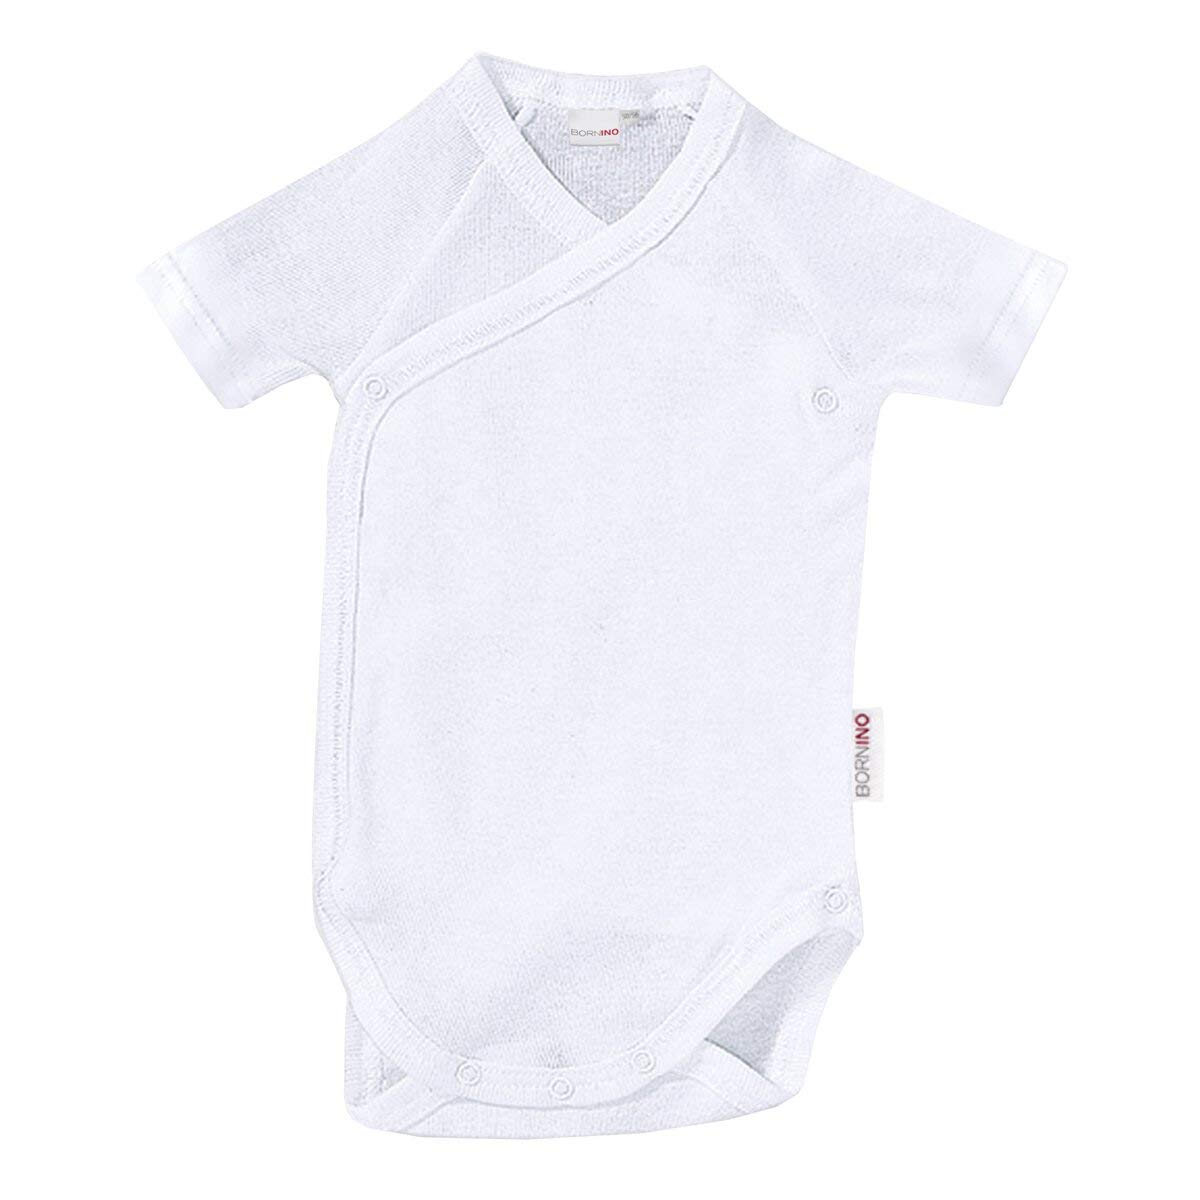 Bornino Body de naissance manches courtes bébé blanc b8d0042bc76